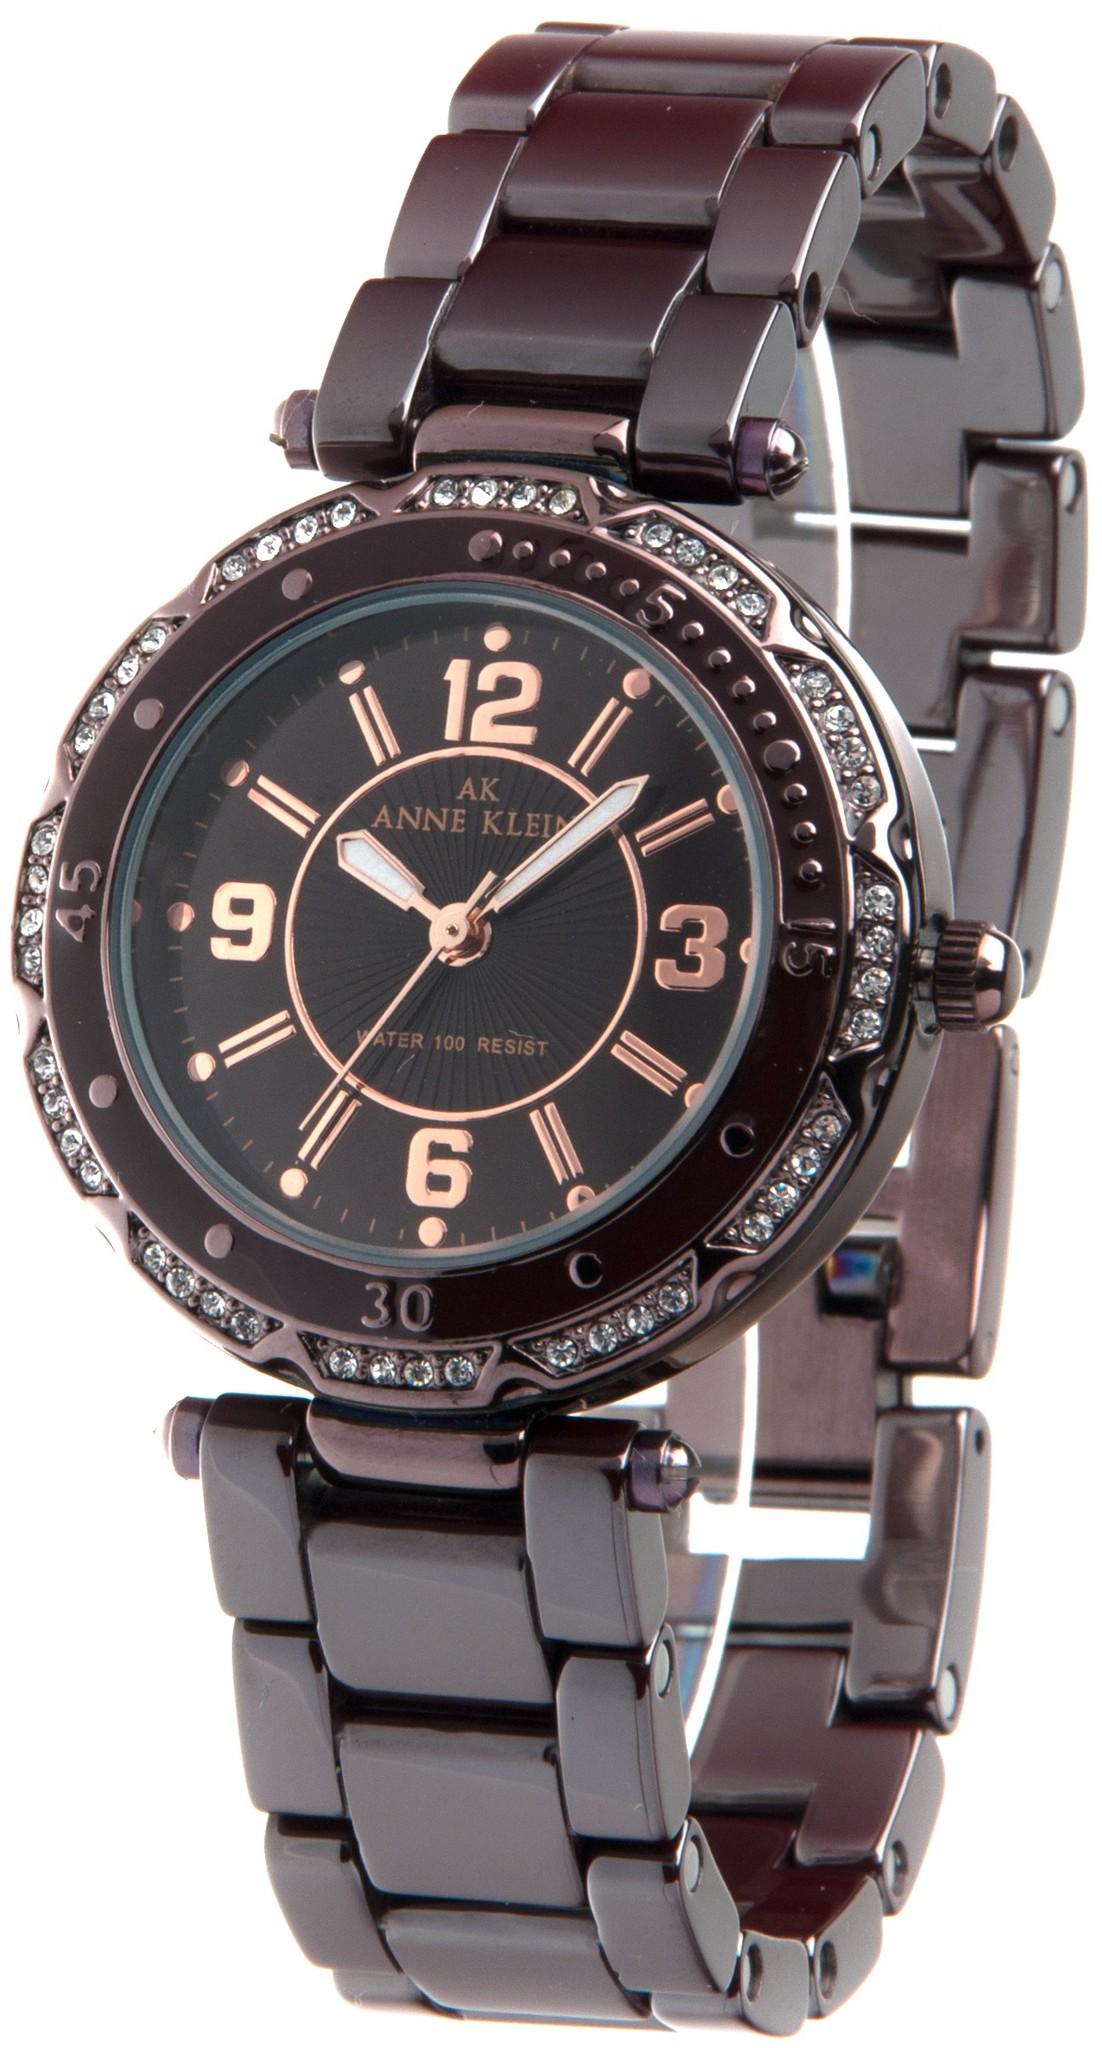 Anne Klein 9703BMBN - женские наручные часы из коллекции CeramicsAnne Klein<br><br><br>Бренд: Anne Klein<br>Модель: Anne Klein 9703 BMBN<br>Артикул: 9703BMBN<br>Вариант артикула: None<br>Коллекция: Ceramics<br>Подколлекция: None<br>Страна: США<br>Пол: женские<br>Тип механизма: кварцевые<br>Механизм: None<br>Количество камней: None<br>Автоподзавод: None<br>Источник энергии: от батарейки<br>Срок службы элемента питания: None<br>Дисплей: стрелки<br>Цифры: арабские<br>Водозащита: WR 30<br>Противоударные: None<br>Материал корпуса: не указан, PVD покрытие (полное)<br>Материал браслета: керамика<br>Материал безеля: None<br>Стекло: минеральное<br>Антибликовое покрытие: None<br>Цвет корпуса: None<br>Цвет браслета: None<br>Цвет циферблата: None<br>Цвет безеля: None<br>Размеры: 34 мм<br>Диаметр: None<br>Диаметр корпуса: None<br>Толщина: None<br>Ширина ремешка: None<br>Вес: None<br>Спорт-функции: None<br>Подсветка: стрелок<br>Вставка: кристаллы Swarovski<br>Отображение даты: None<br>Хронограф: None<br>Таймер: None<br>Термометр: None<br>Хронометр: None<br>GPS: None<br>Радиосинхронизация: None<br>Барометр: None<br>Скелетон: None<br>Дополнительная информация: None<br>Дополнительные функции: None